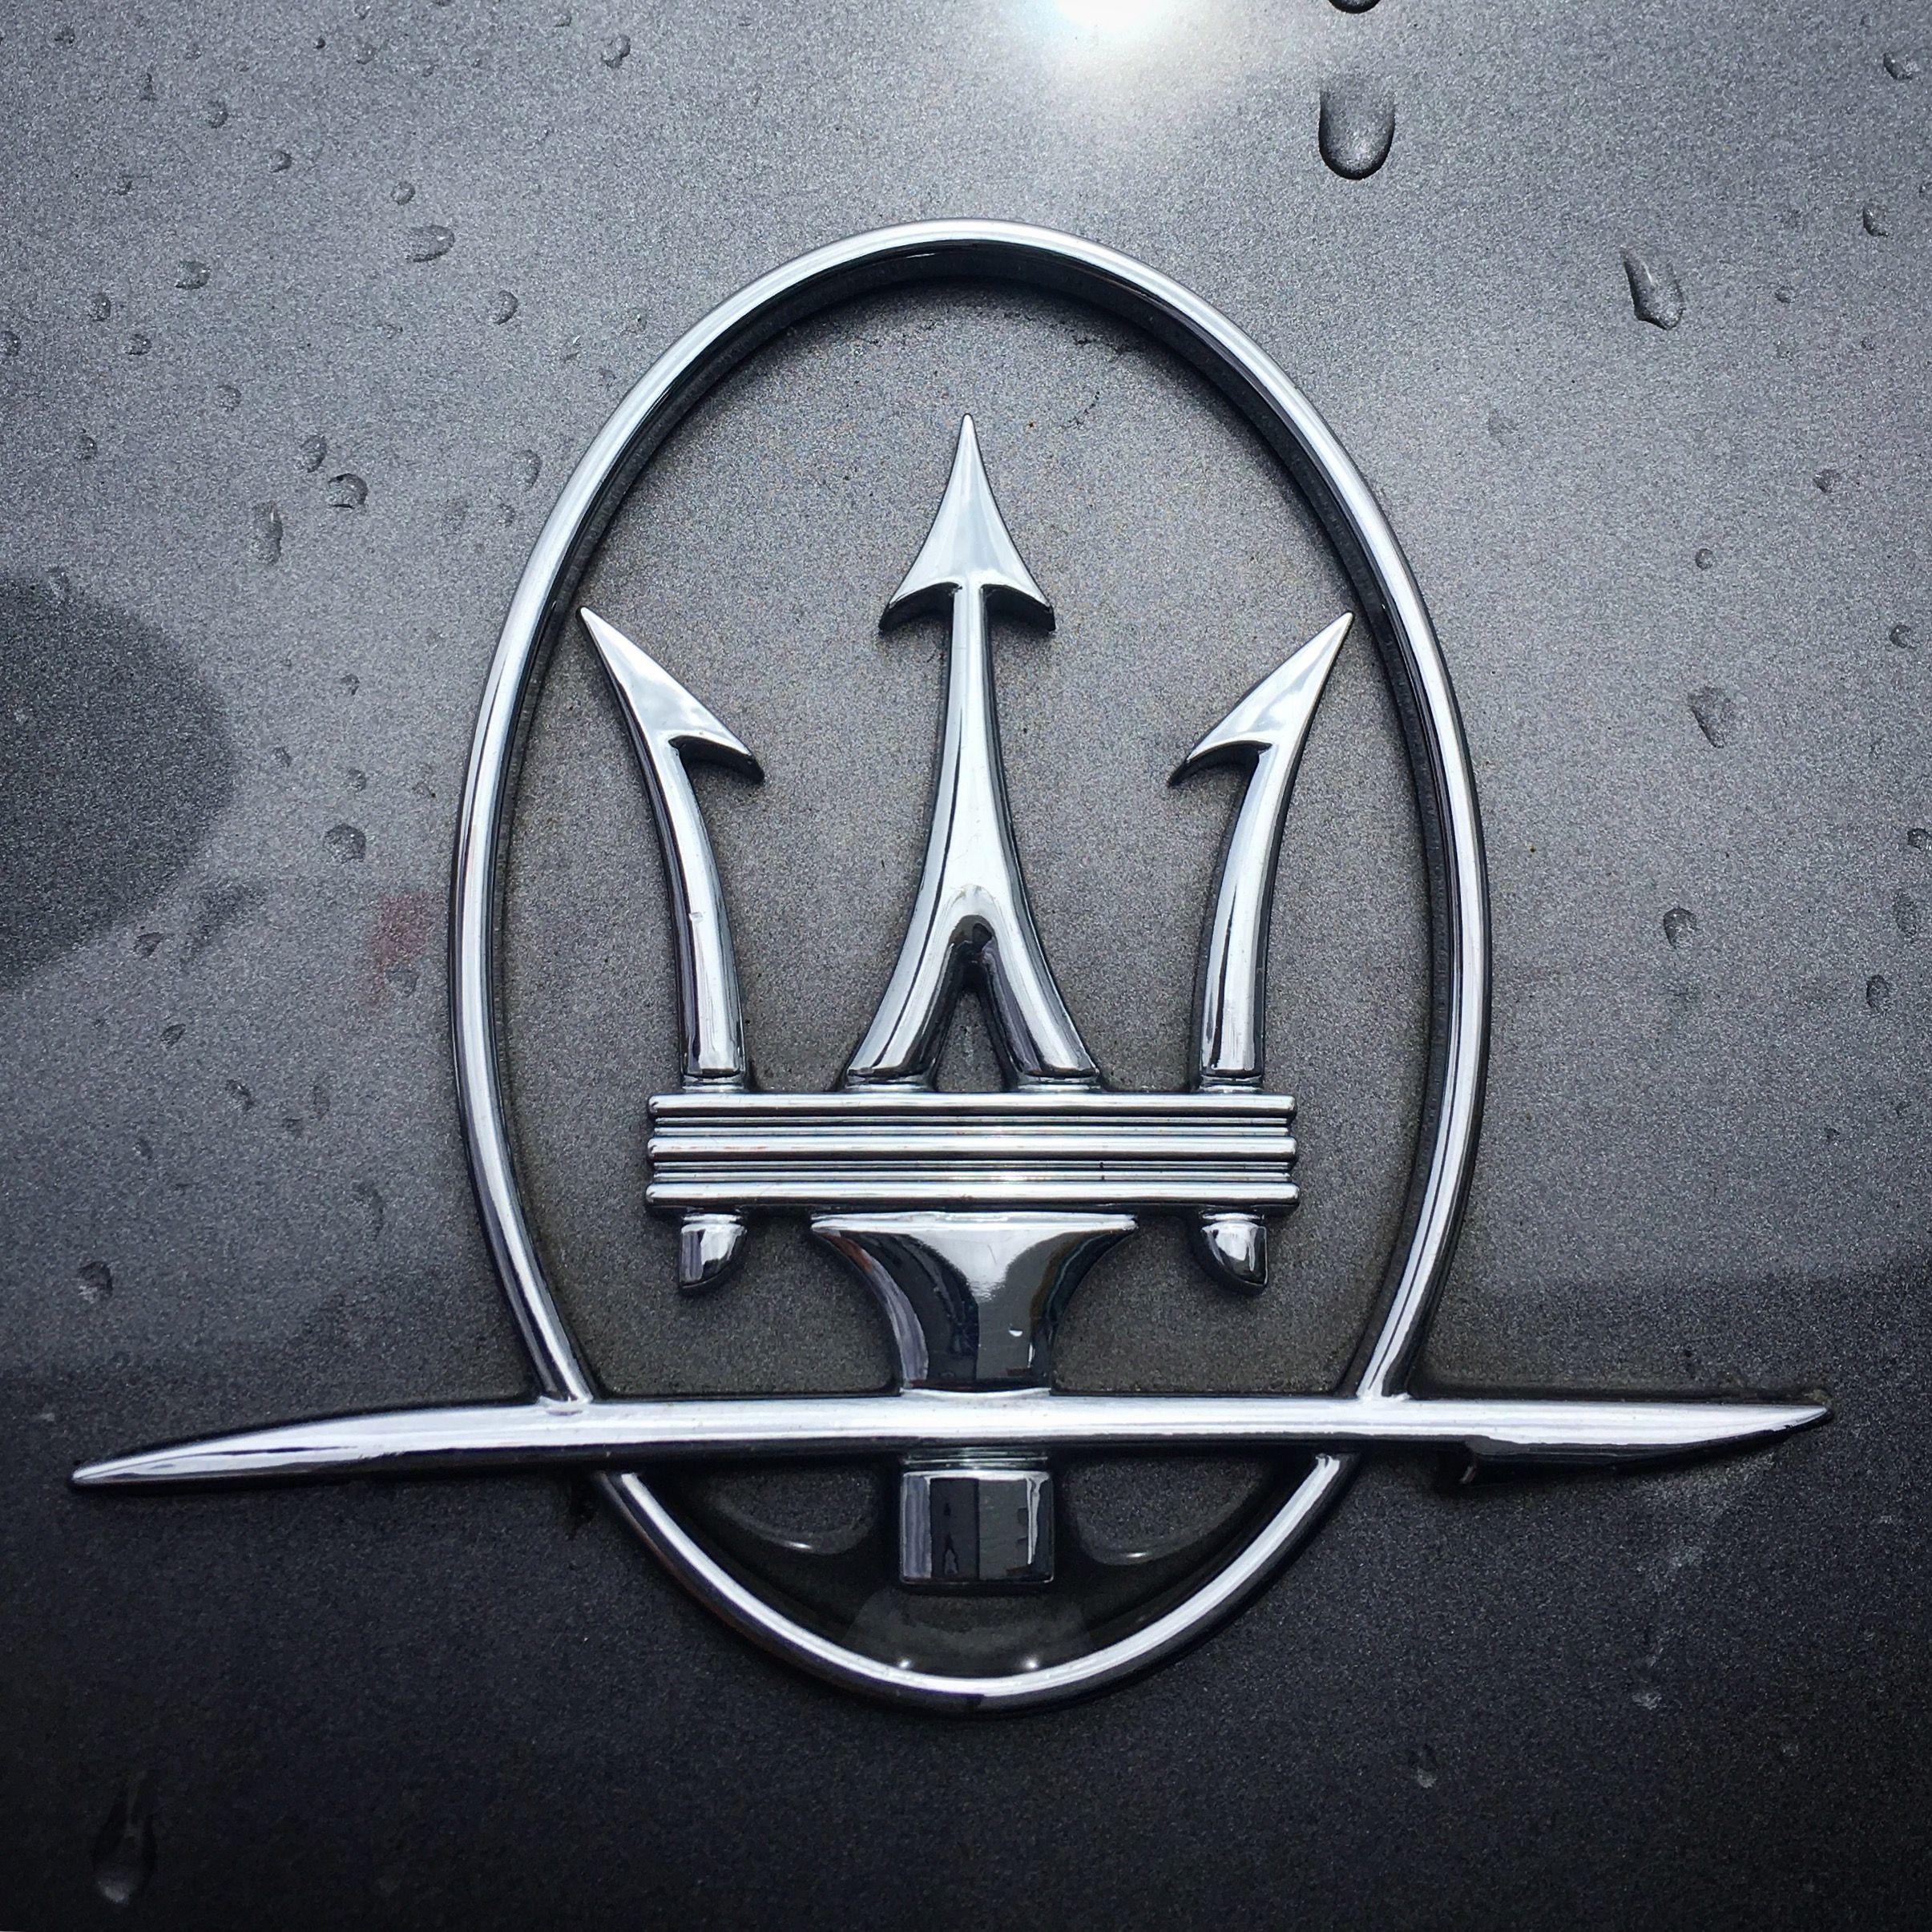 Знак мазерати фото марципана